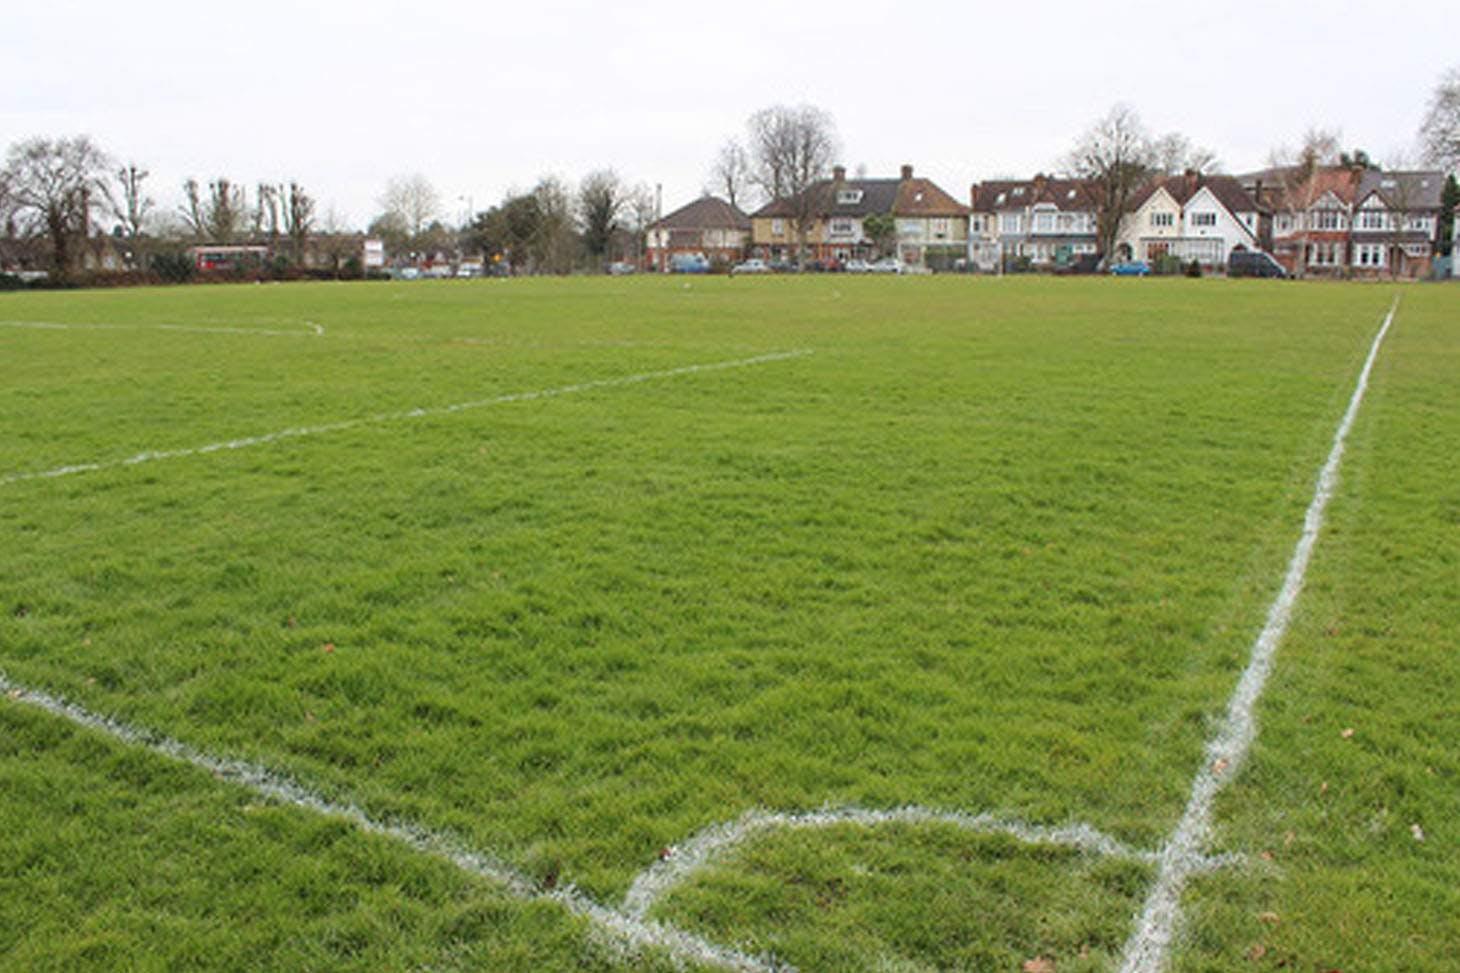 Bishop Rawstorne CE Academy 9 a side | Grass football pitch